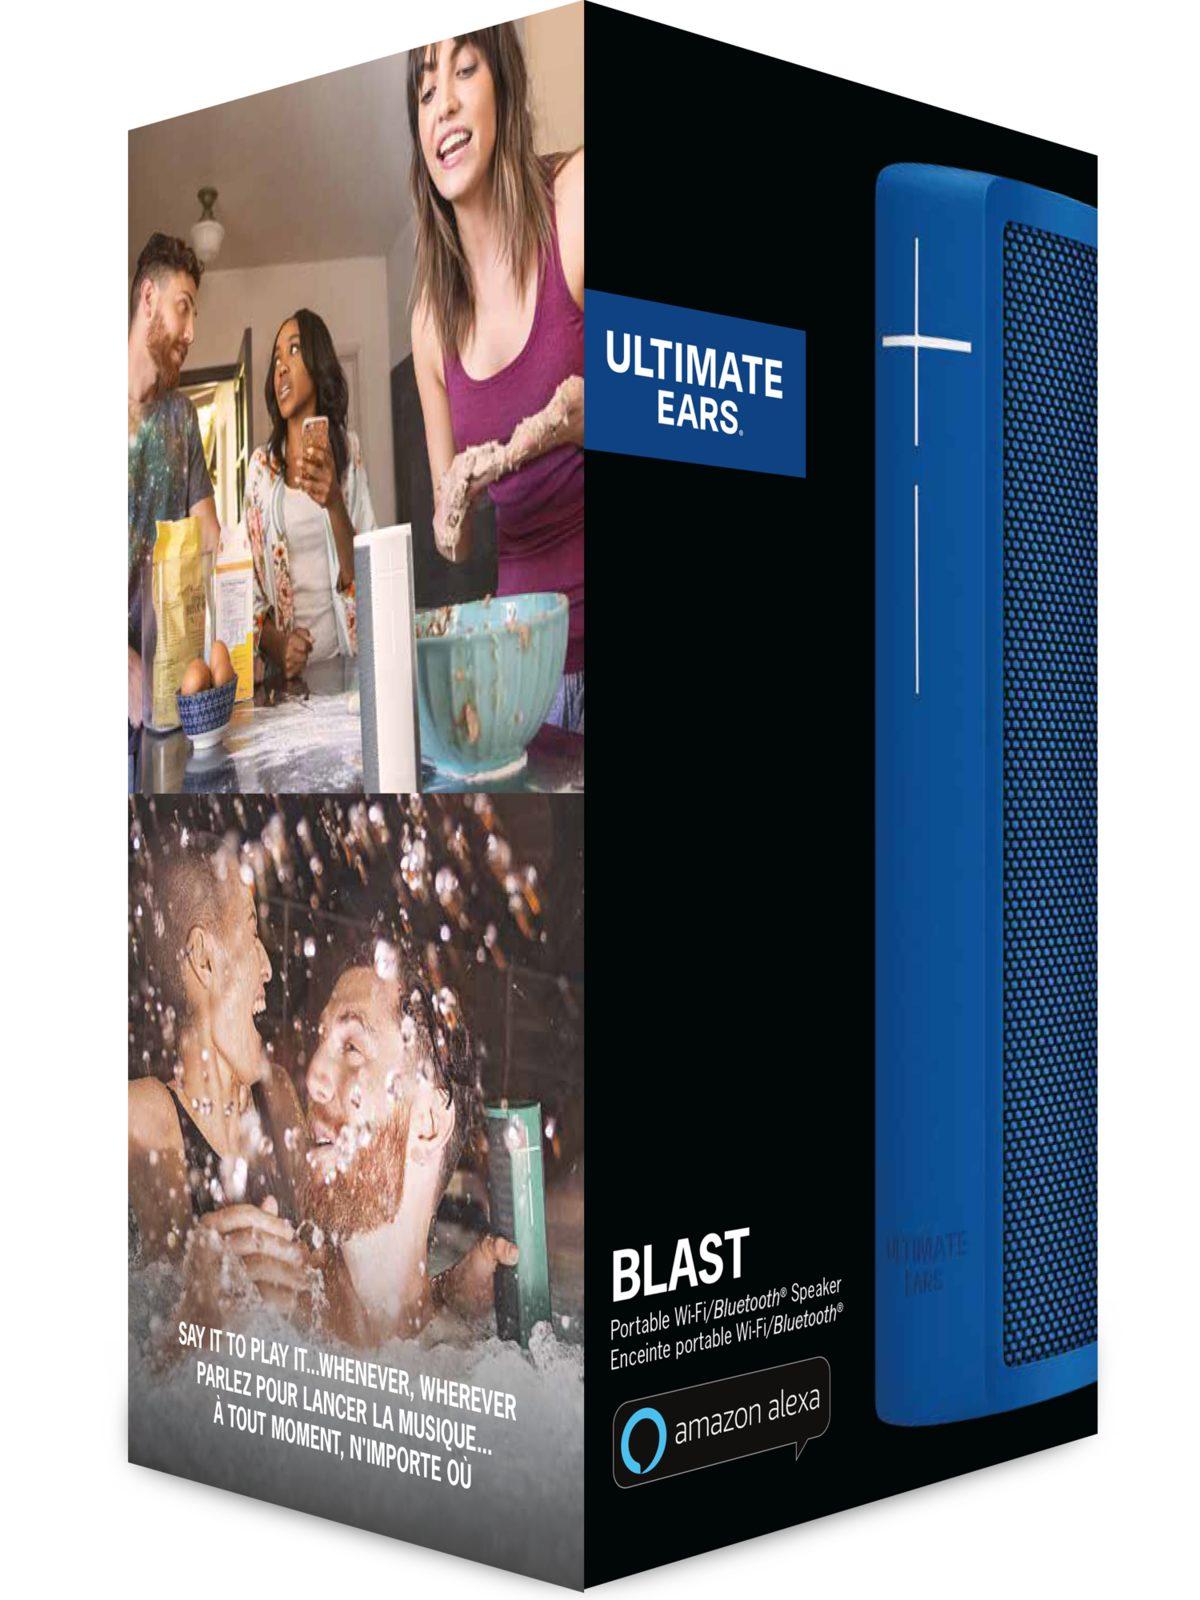 Ultimate Ears BLAST Wireless Portable Speaker with Amazon Alexa